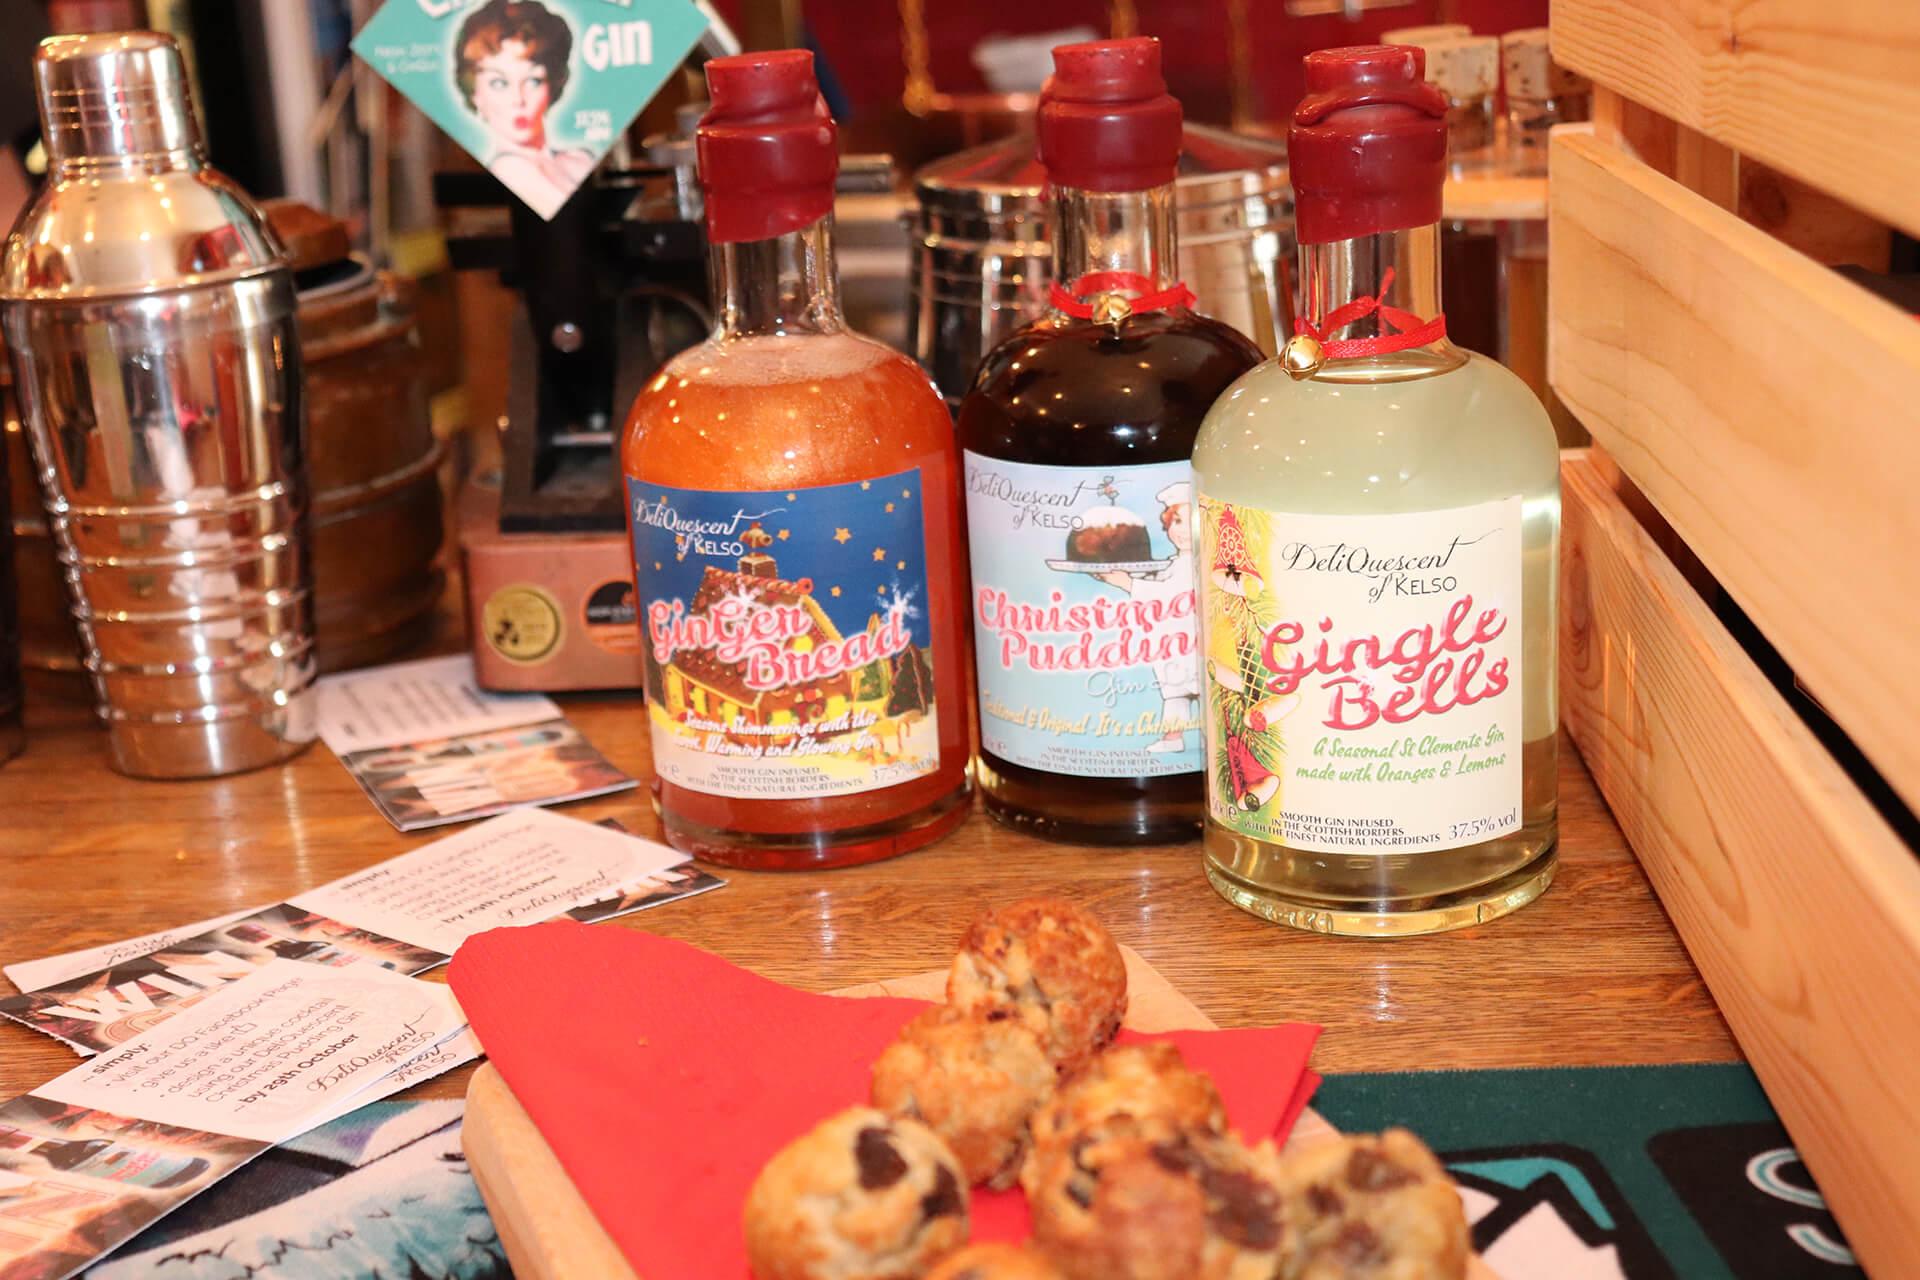 We 3 gins: DeliQuescent's seasonal gin range